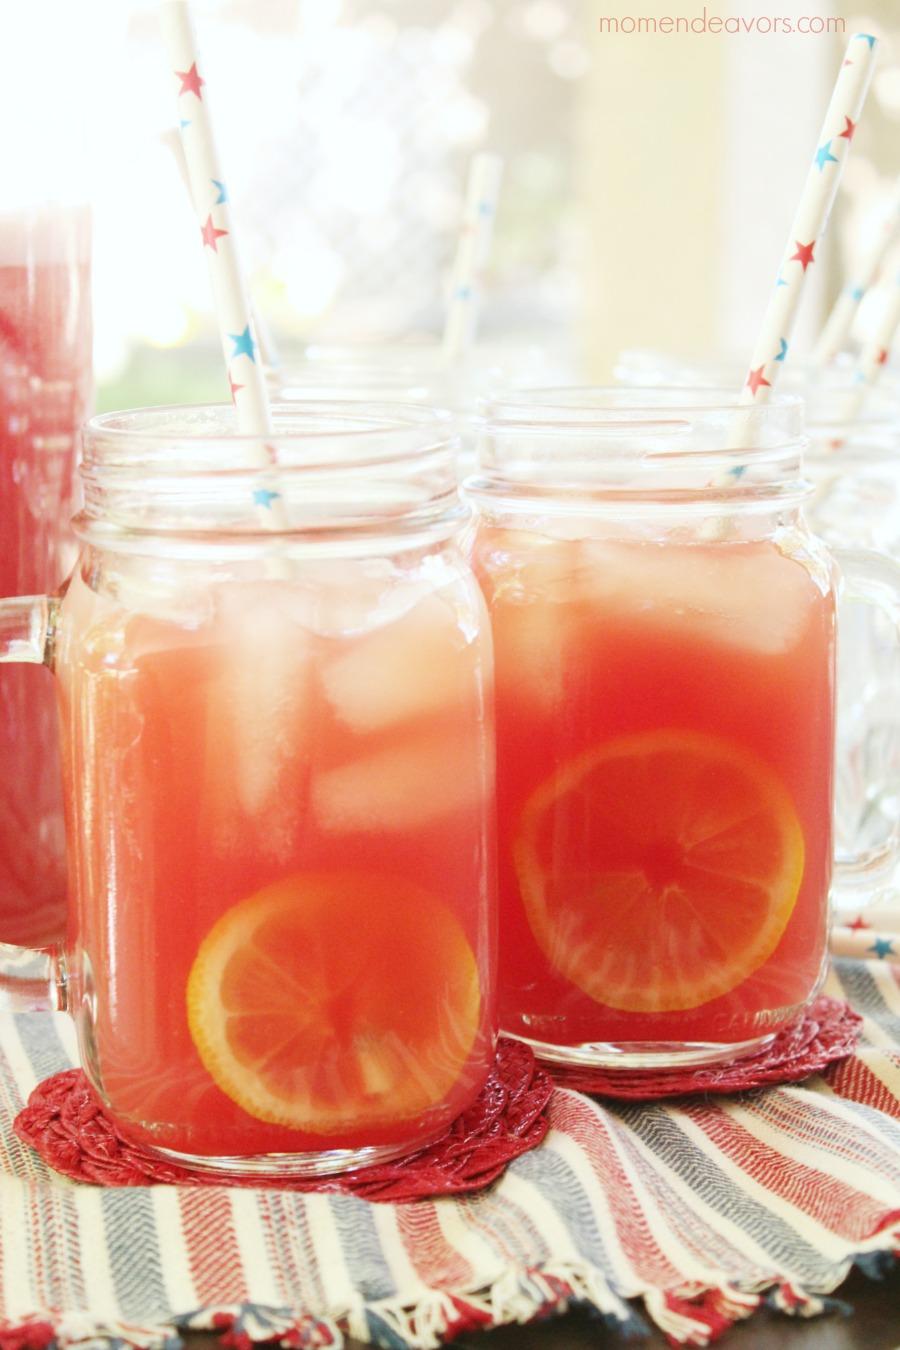 Watermelon Aqua Fresca Recipe